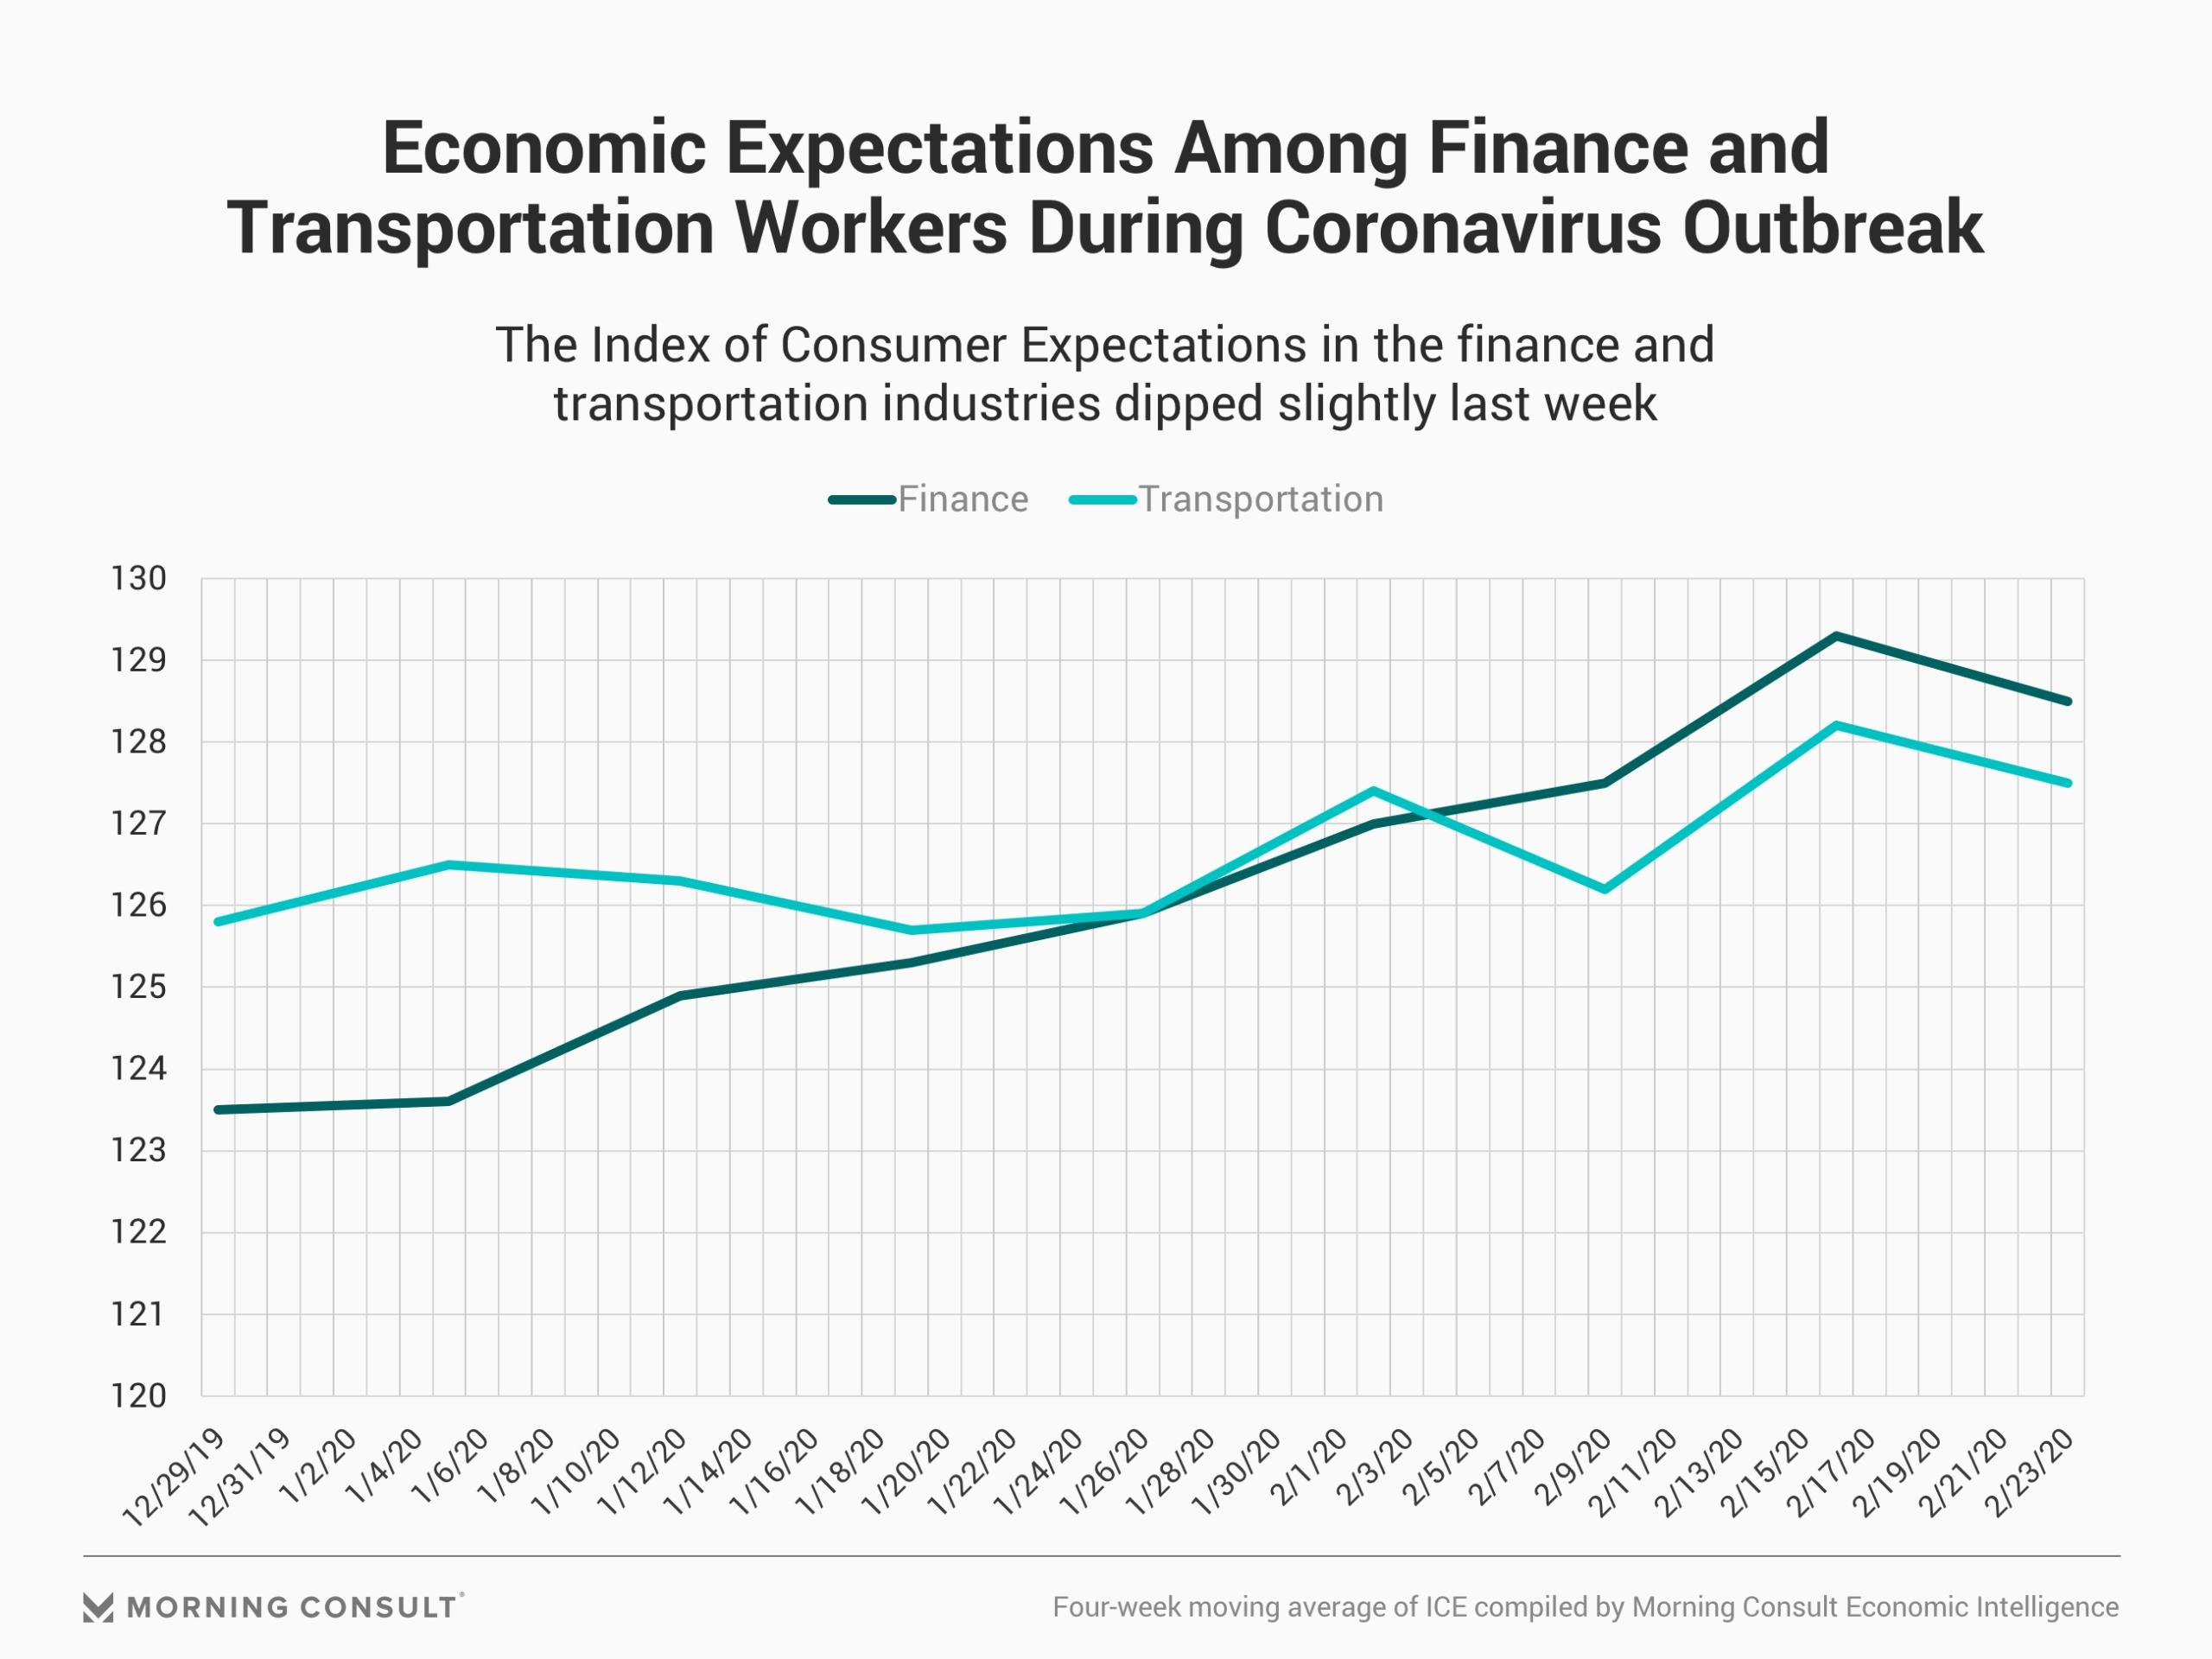 Amid Coronavirus Crisis, Finance, Transport Sectors See Dip